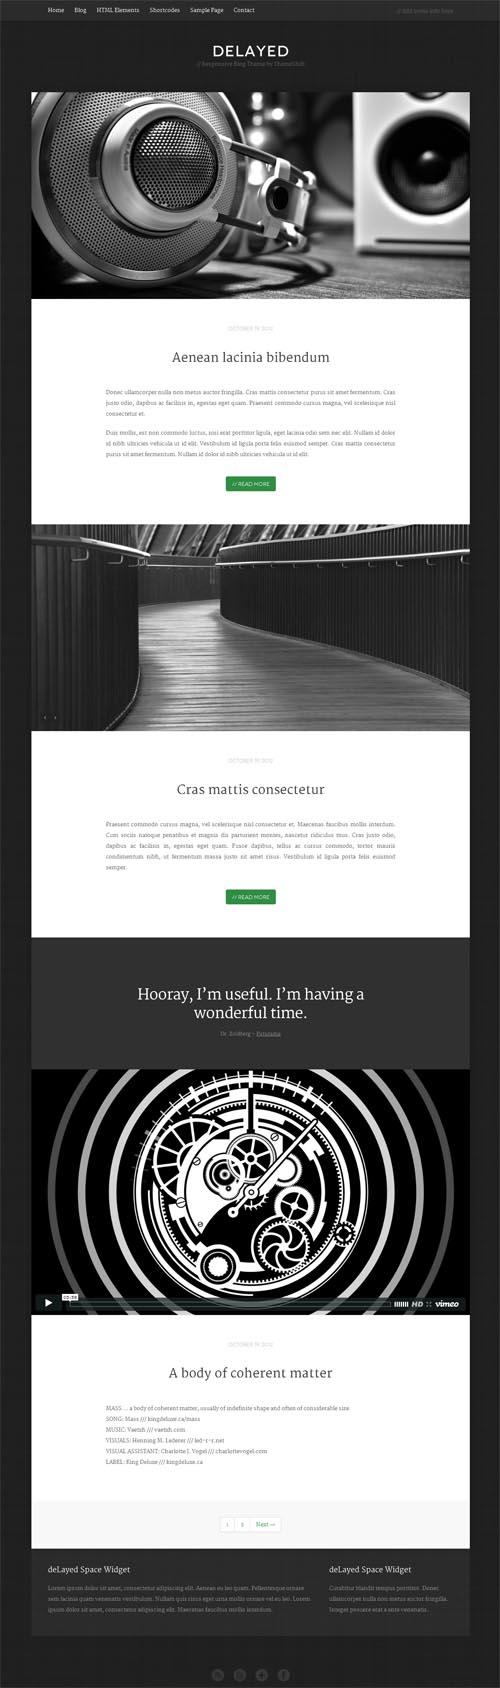 delayed WordPress Theme